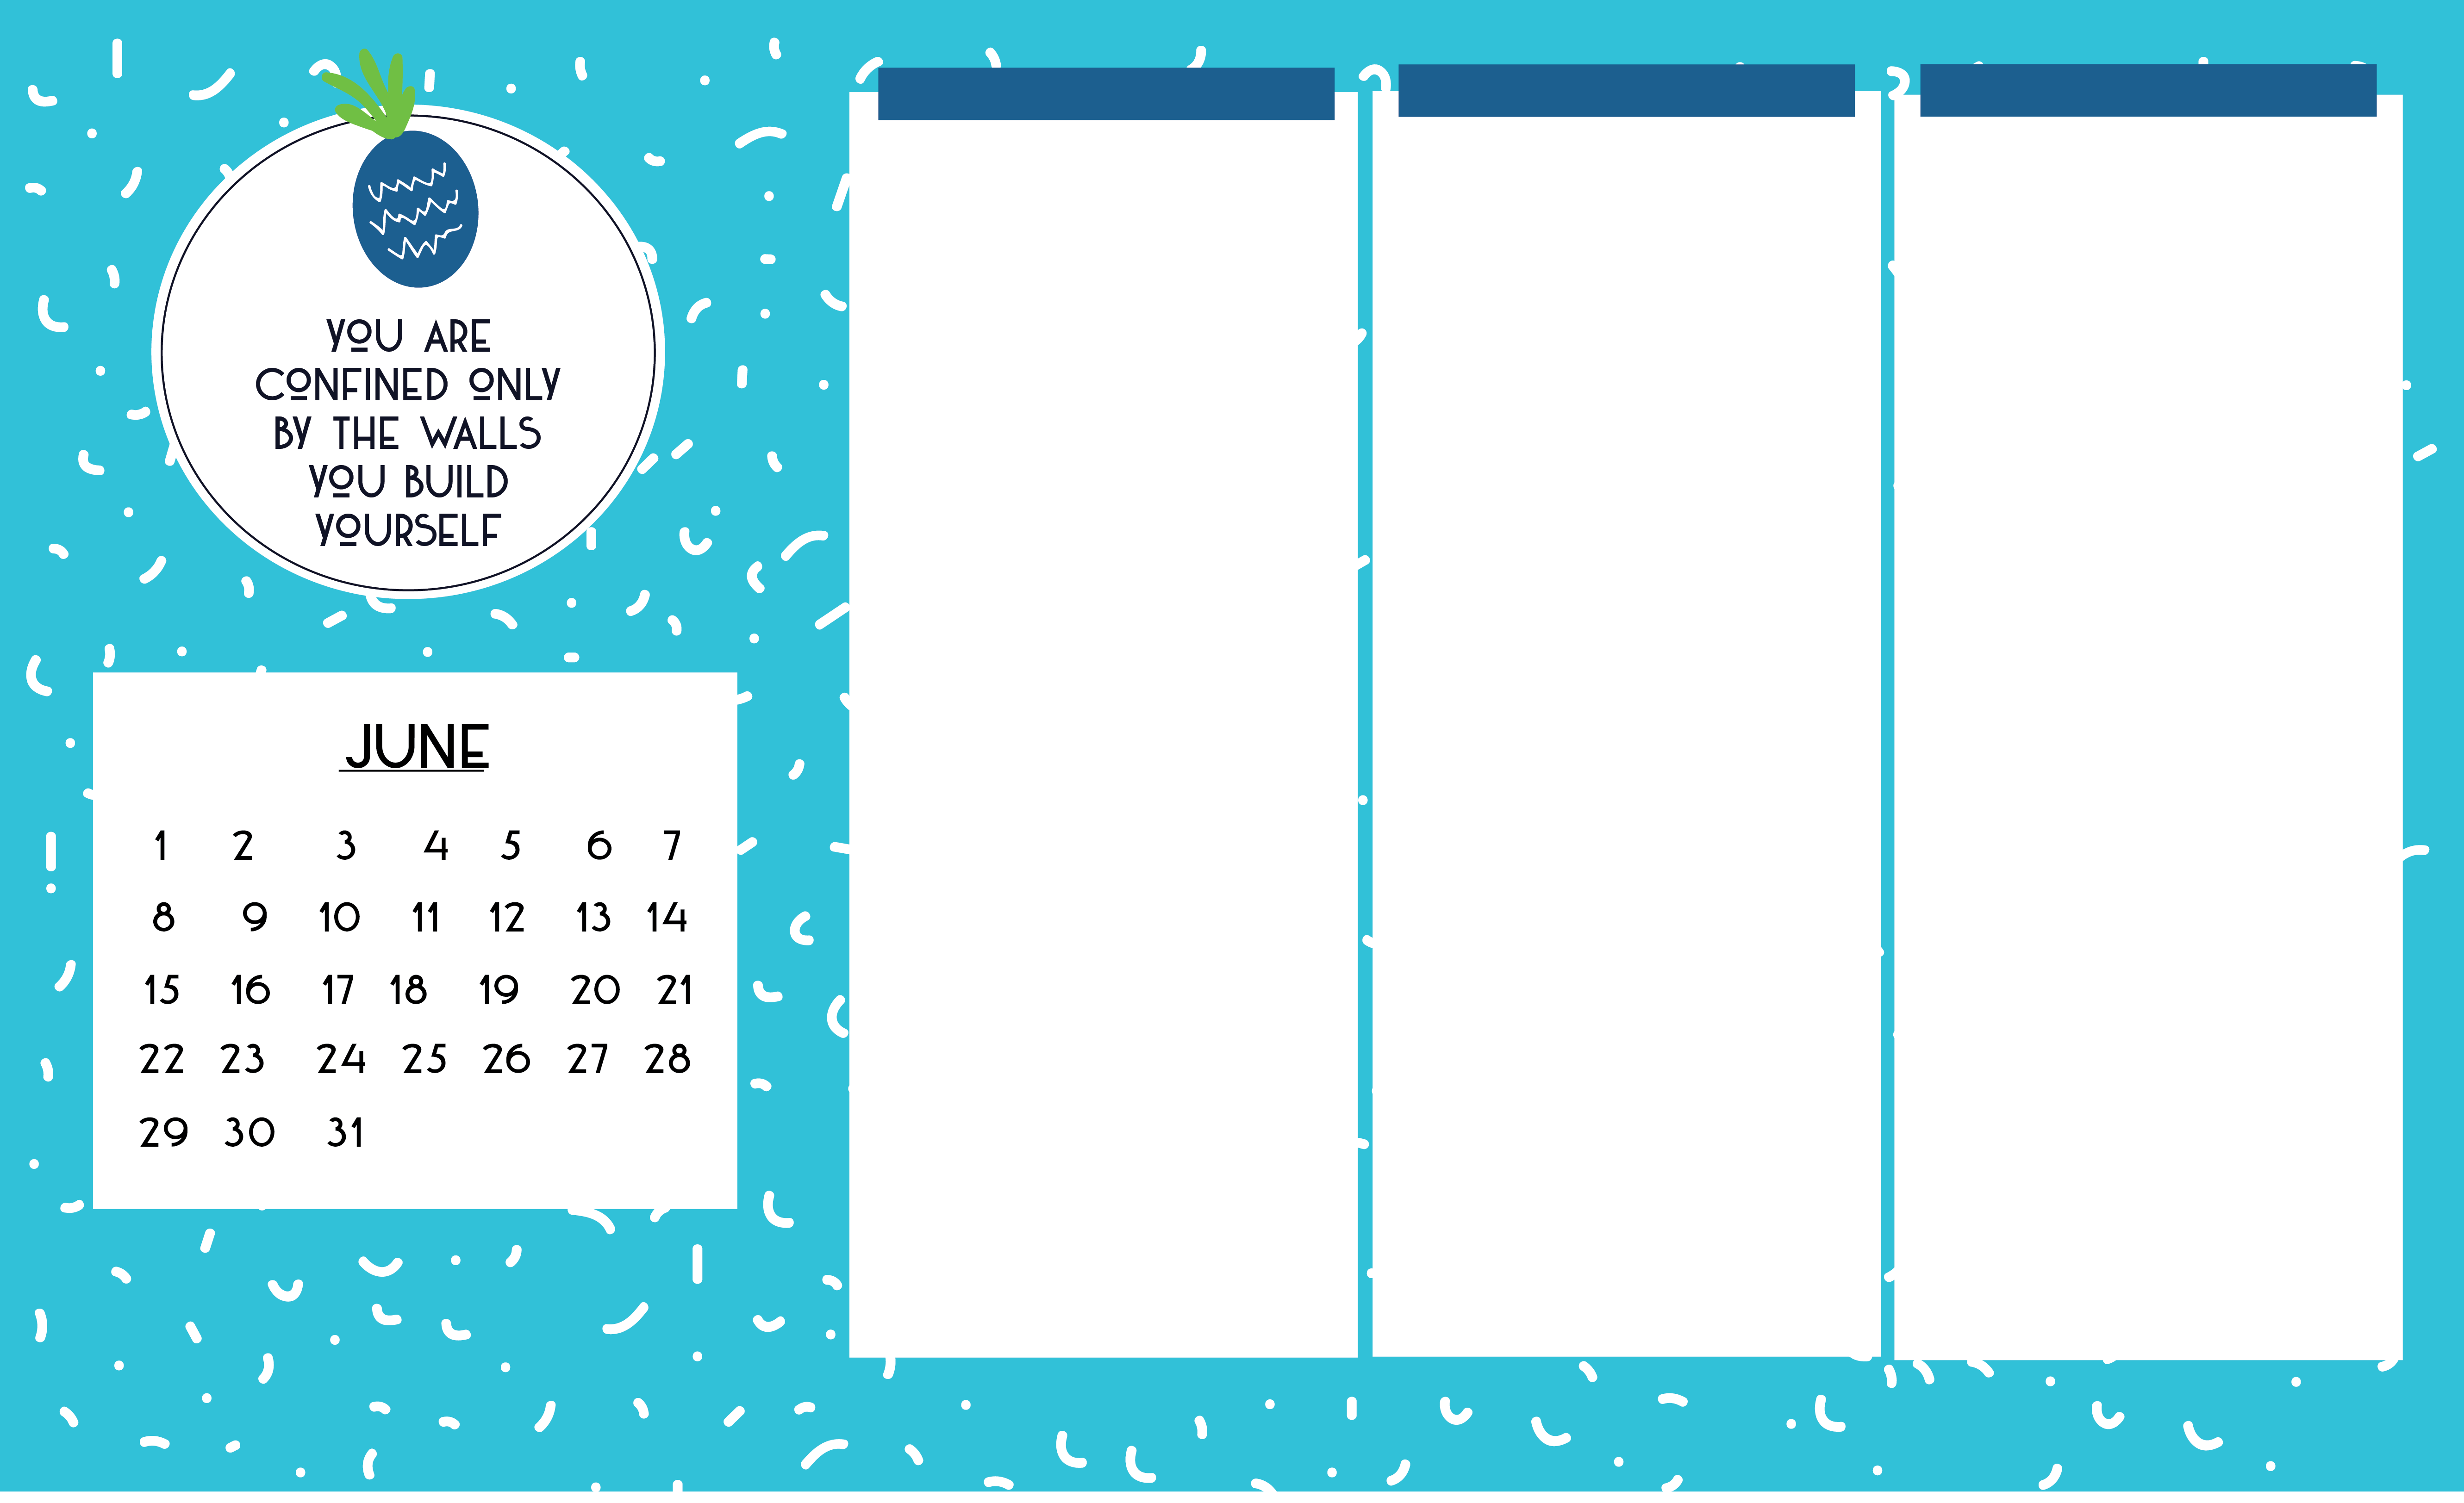 desktop organizer wallpaper background changecover the month add titleheaders in